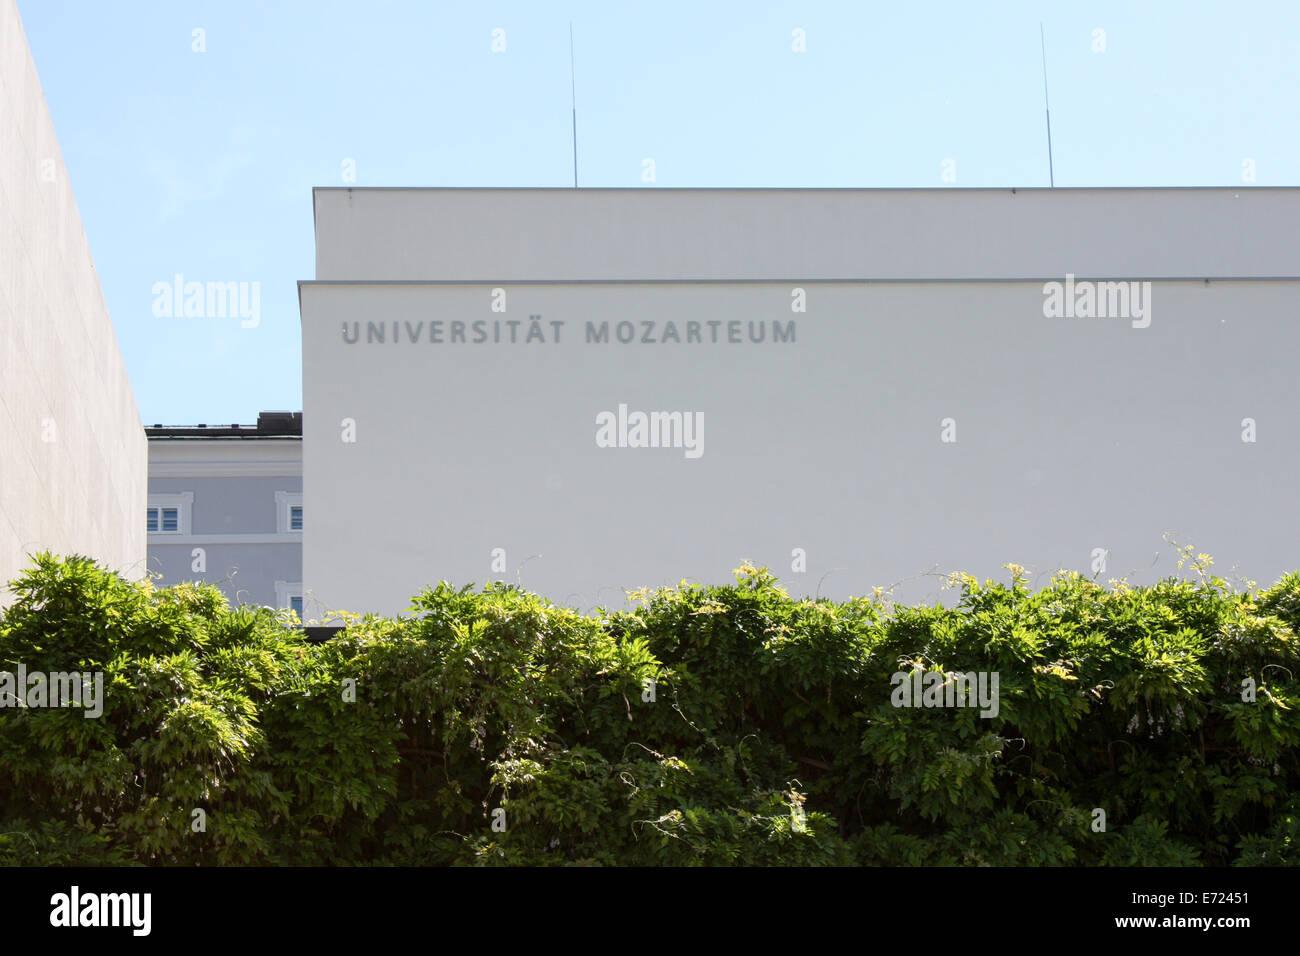 Austria: University Mozarteum in Salzburg. Photo from 17 May 2009. Stock Photo